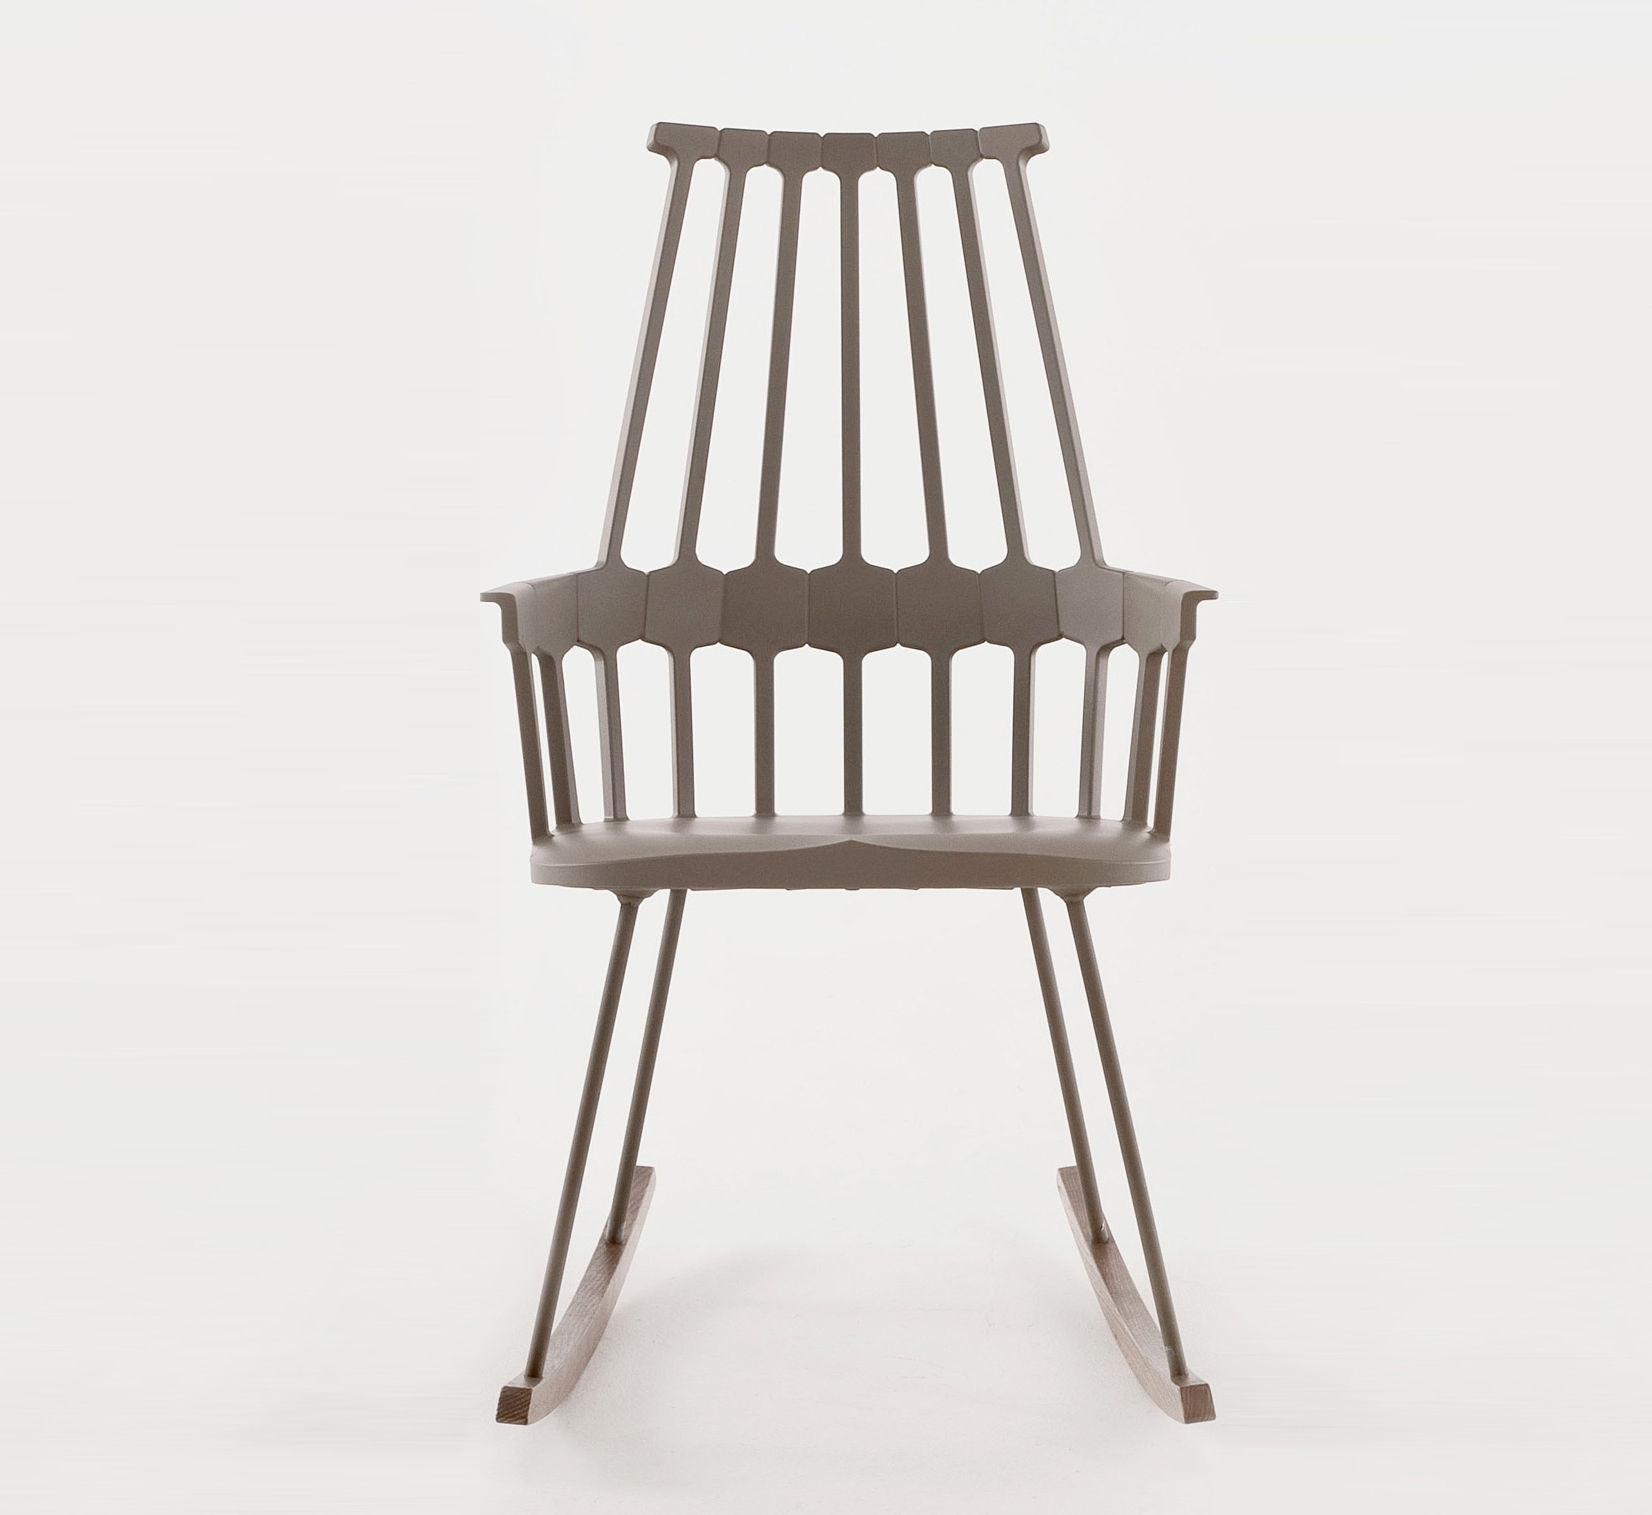 rocking chair comback polycarbonate pieds bois noisette bois kartell. Black Bedroom Furniture Sets. Home Design Ideas